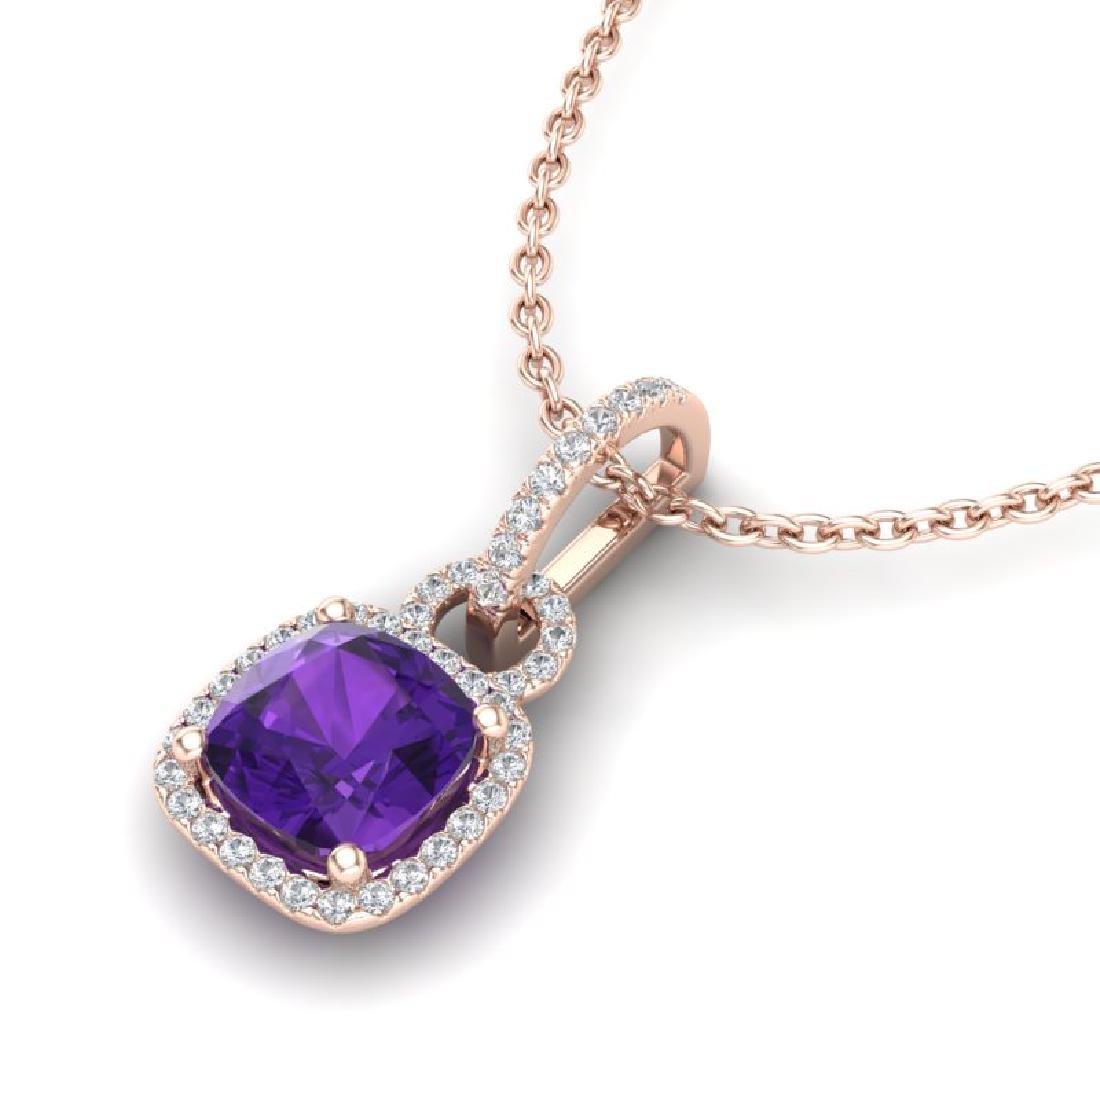 3.50 CTW Amethyst & Micro VS/SI Diamond Necklace 14K